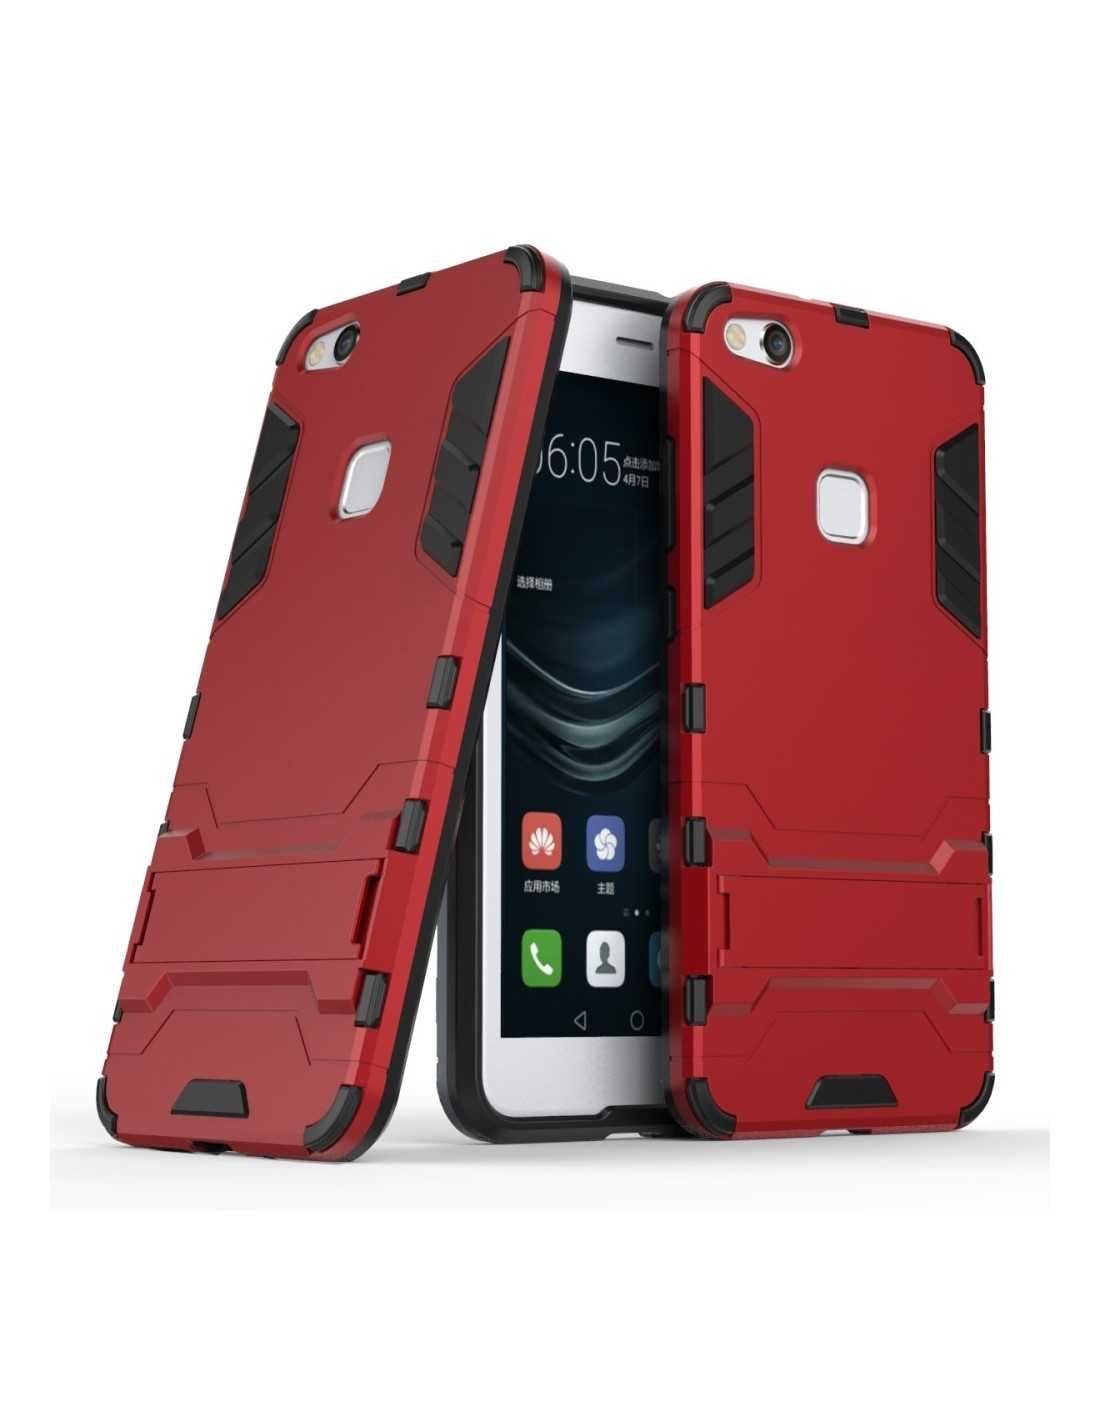 Coque antichoc Hybride Huawei P10 Lite Rouge